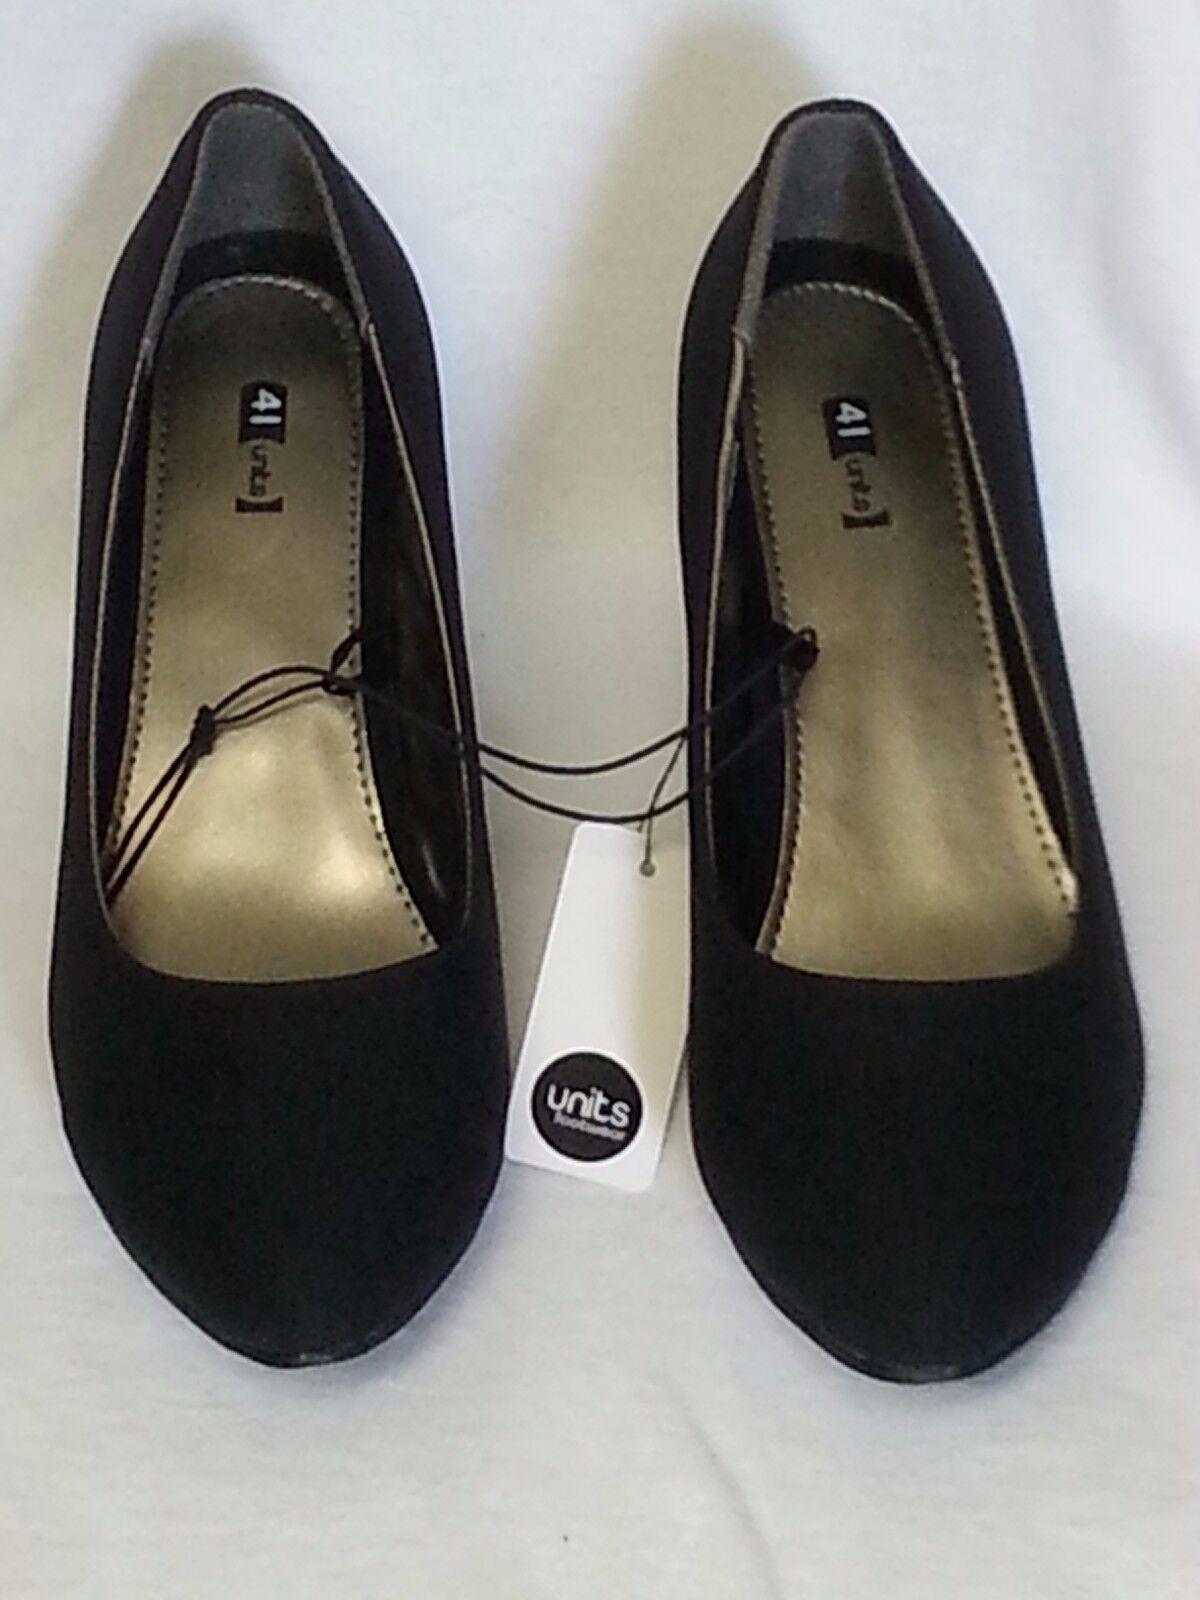 schwarze Damen Pumps Absatzschuhe Schuhe units footwear